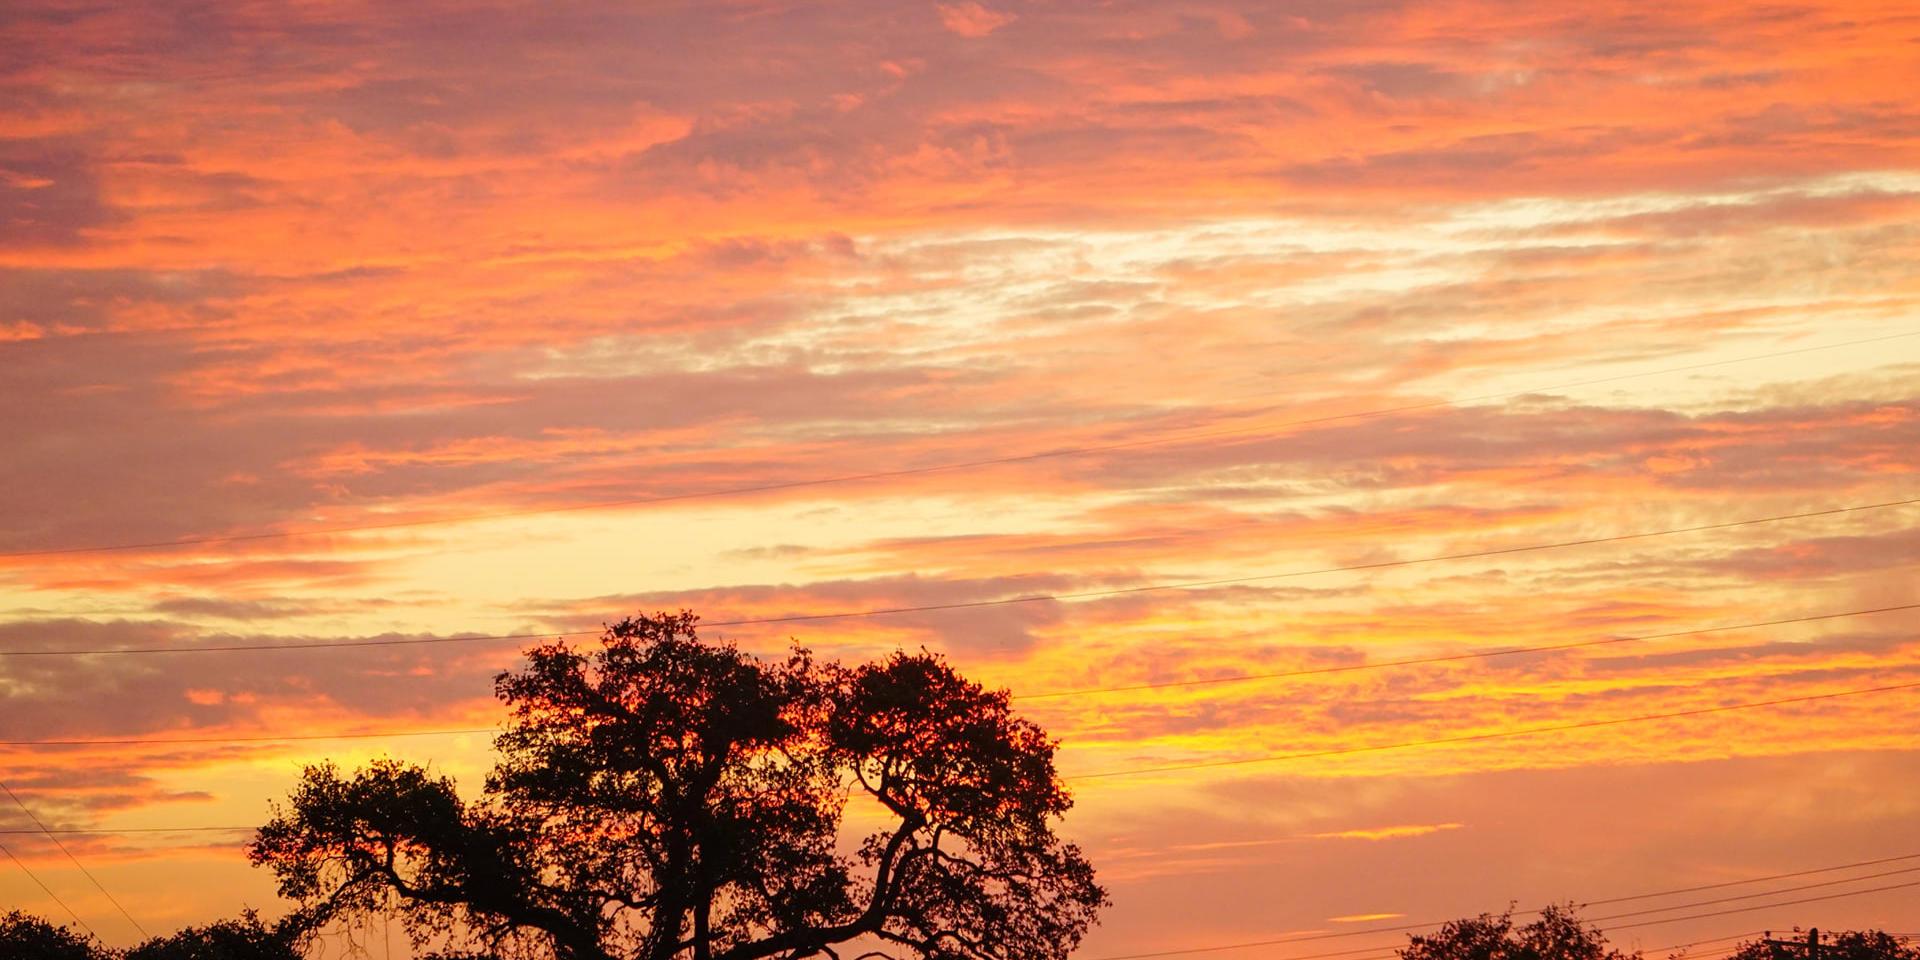 Morning Prayer and Psalms 5